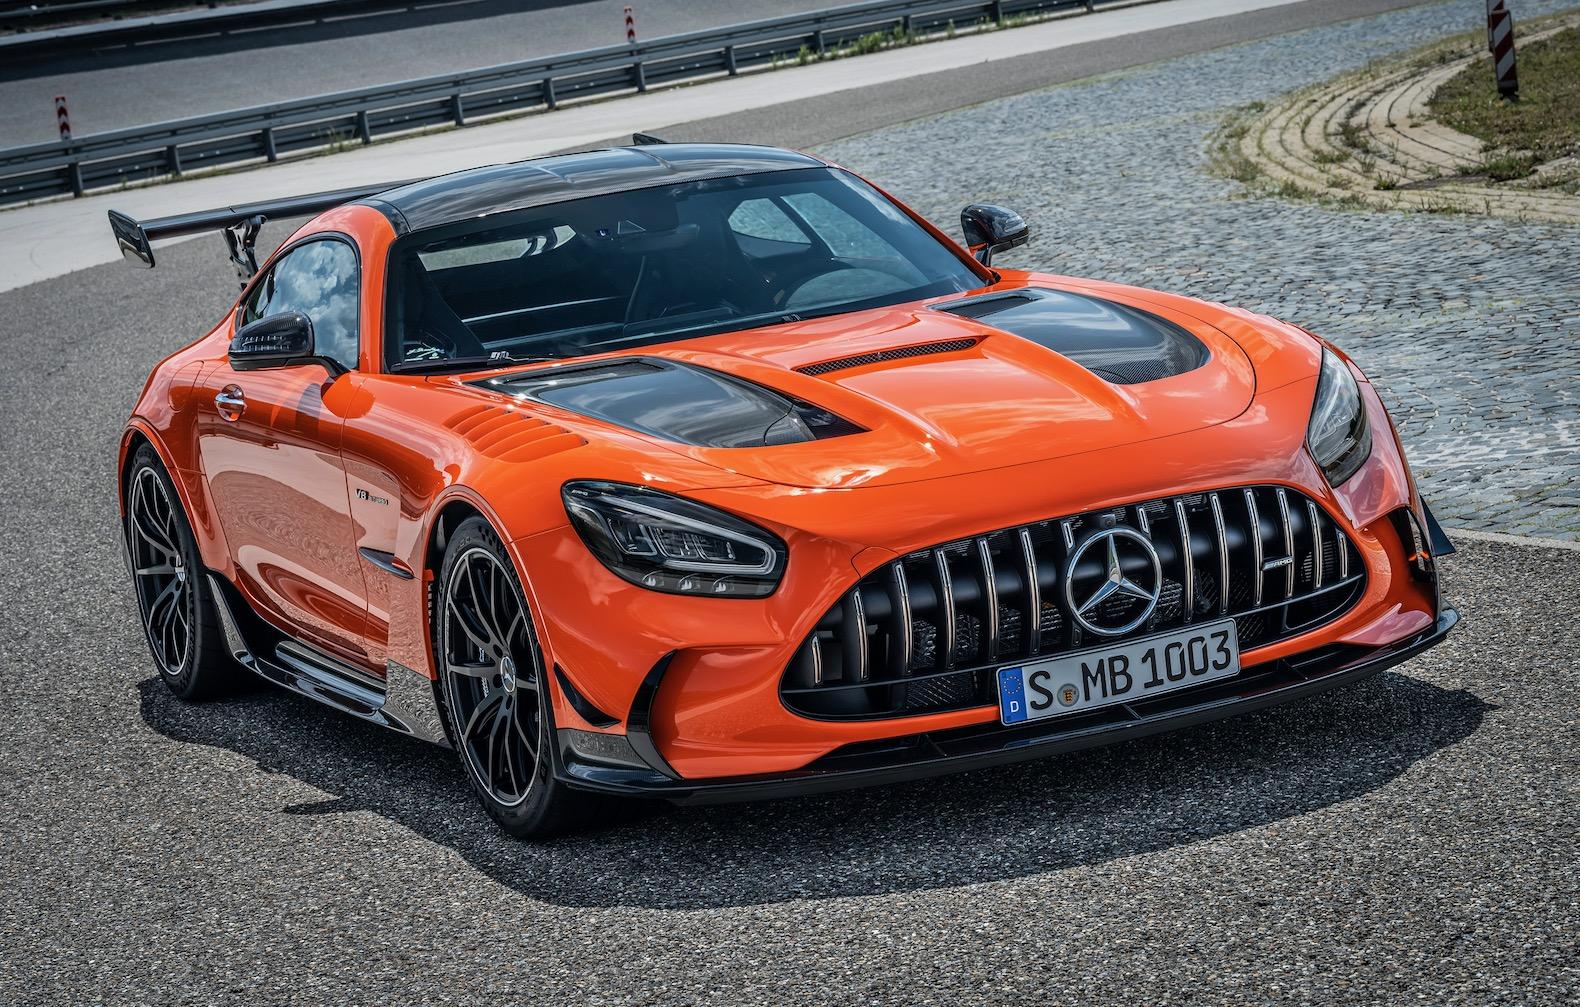 2021 Mercedes-AMG GT Black Series is very pricey | The ...